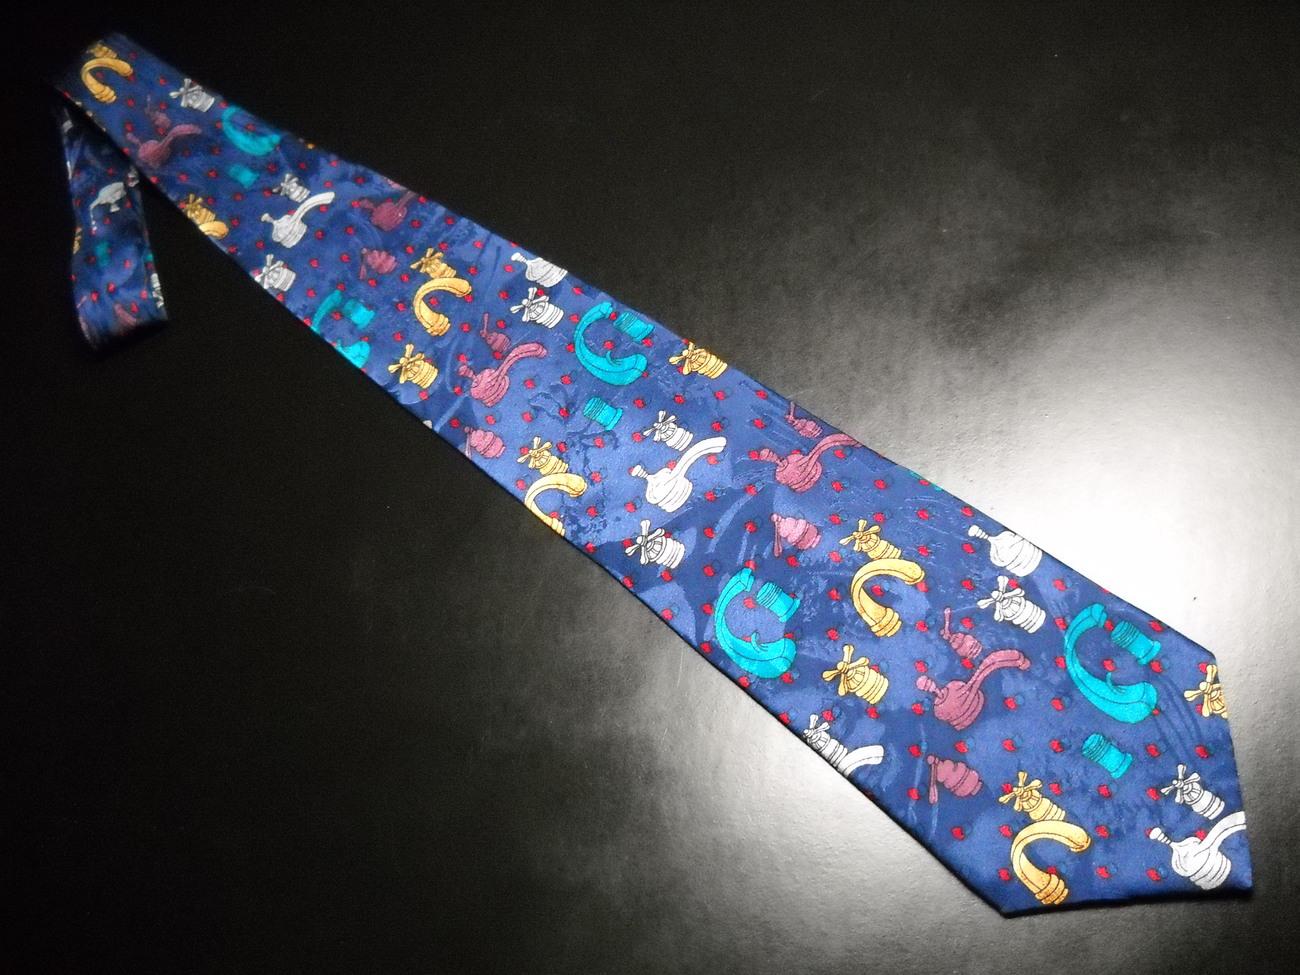 Tie oscardo faceuts on bright blue 04